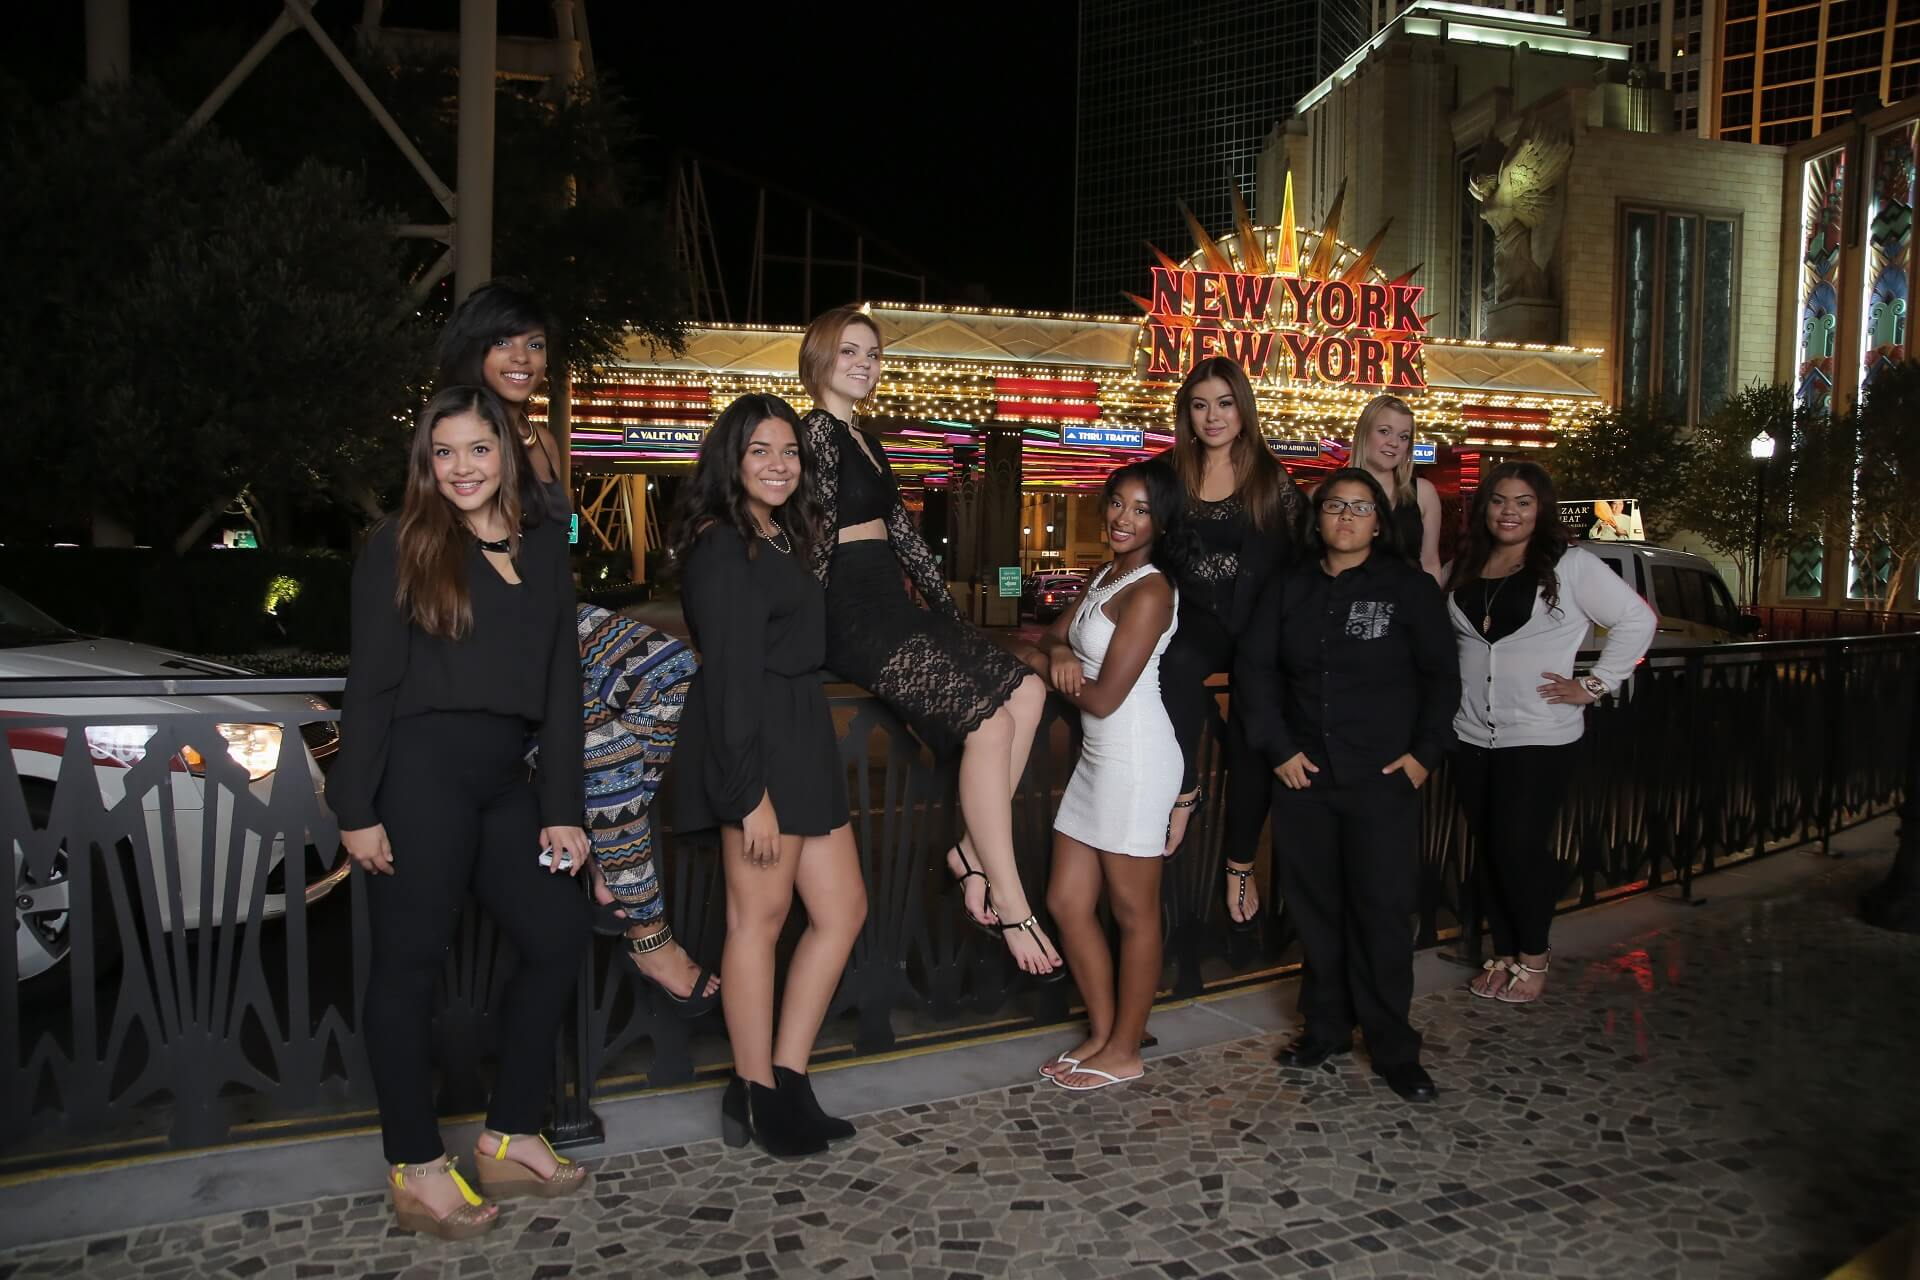 NY NY Large Group Photo Tour